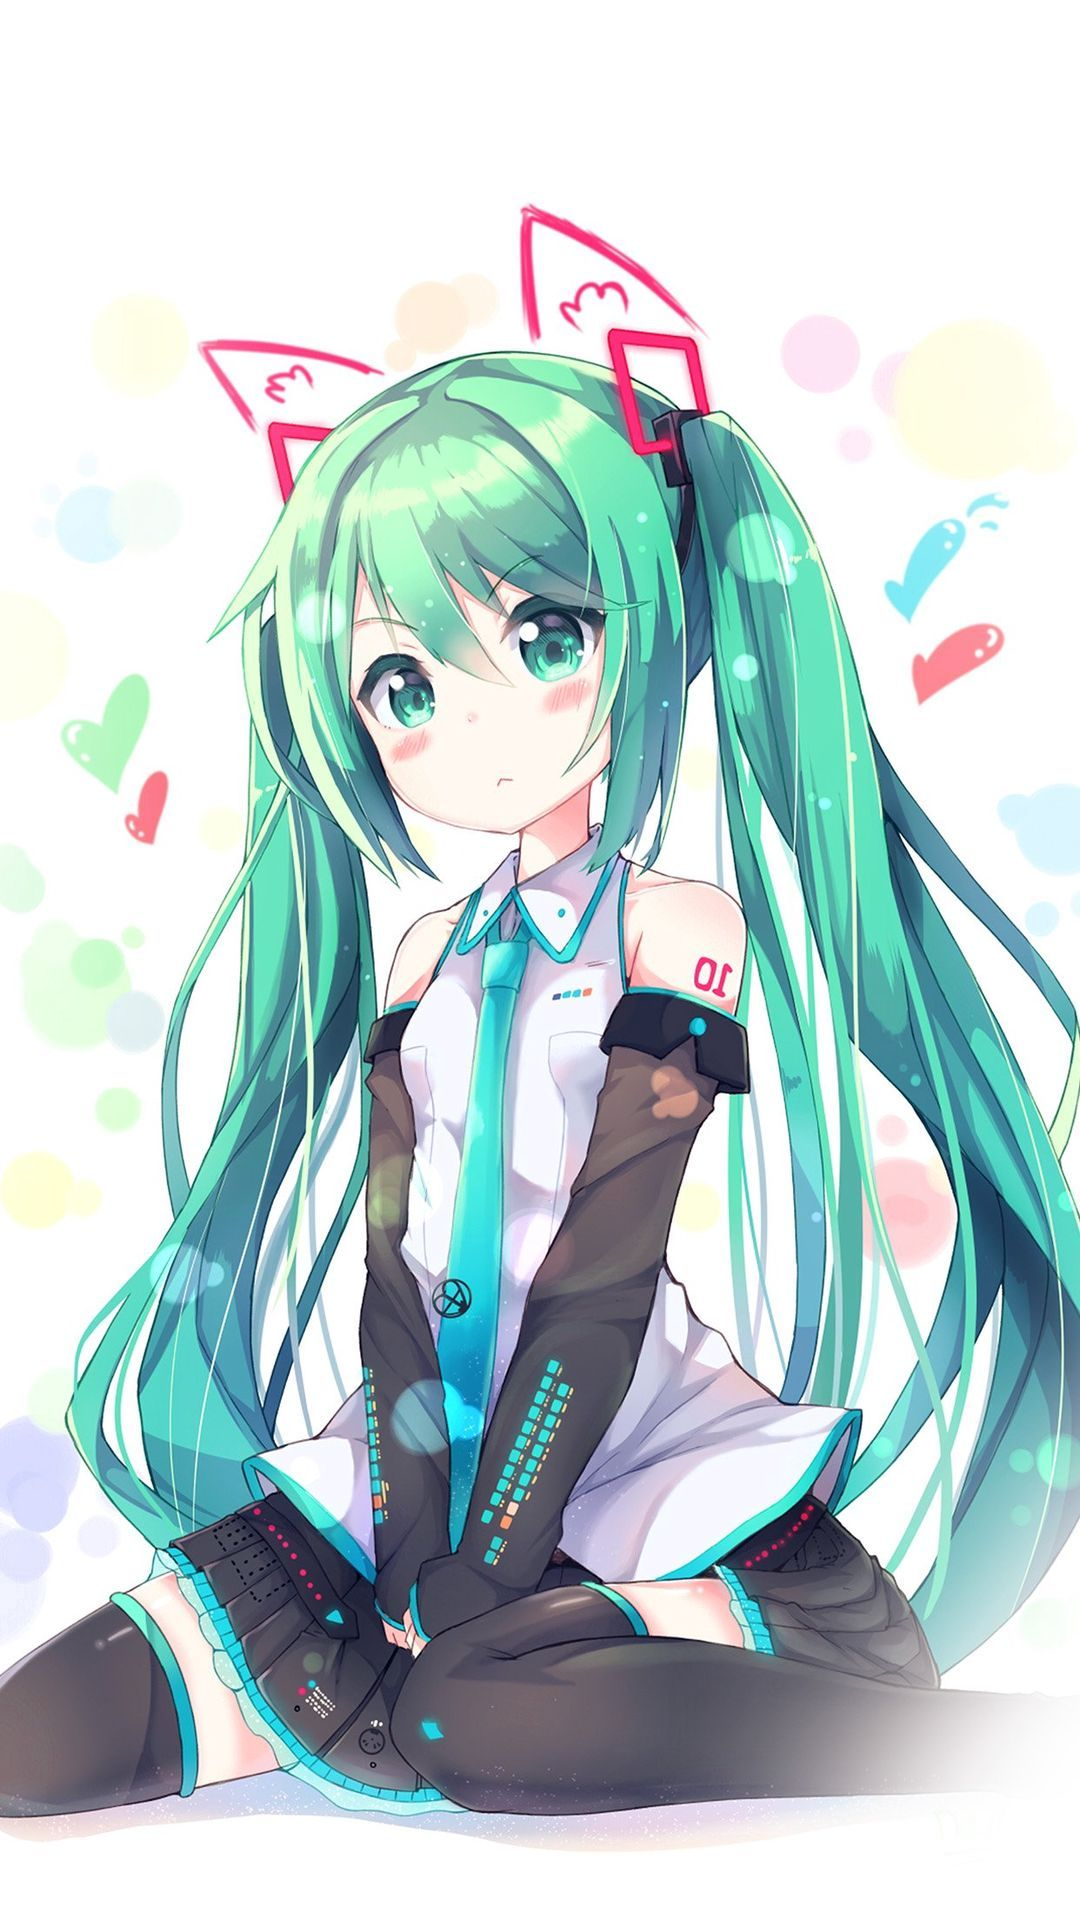 •♥︎• Anime Wallpapers •♥︎•